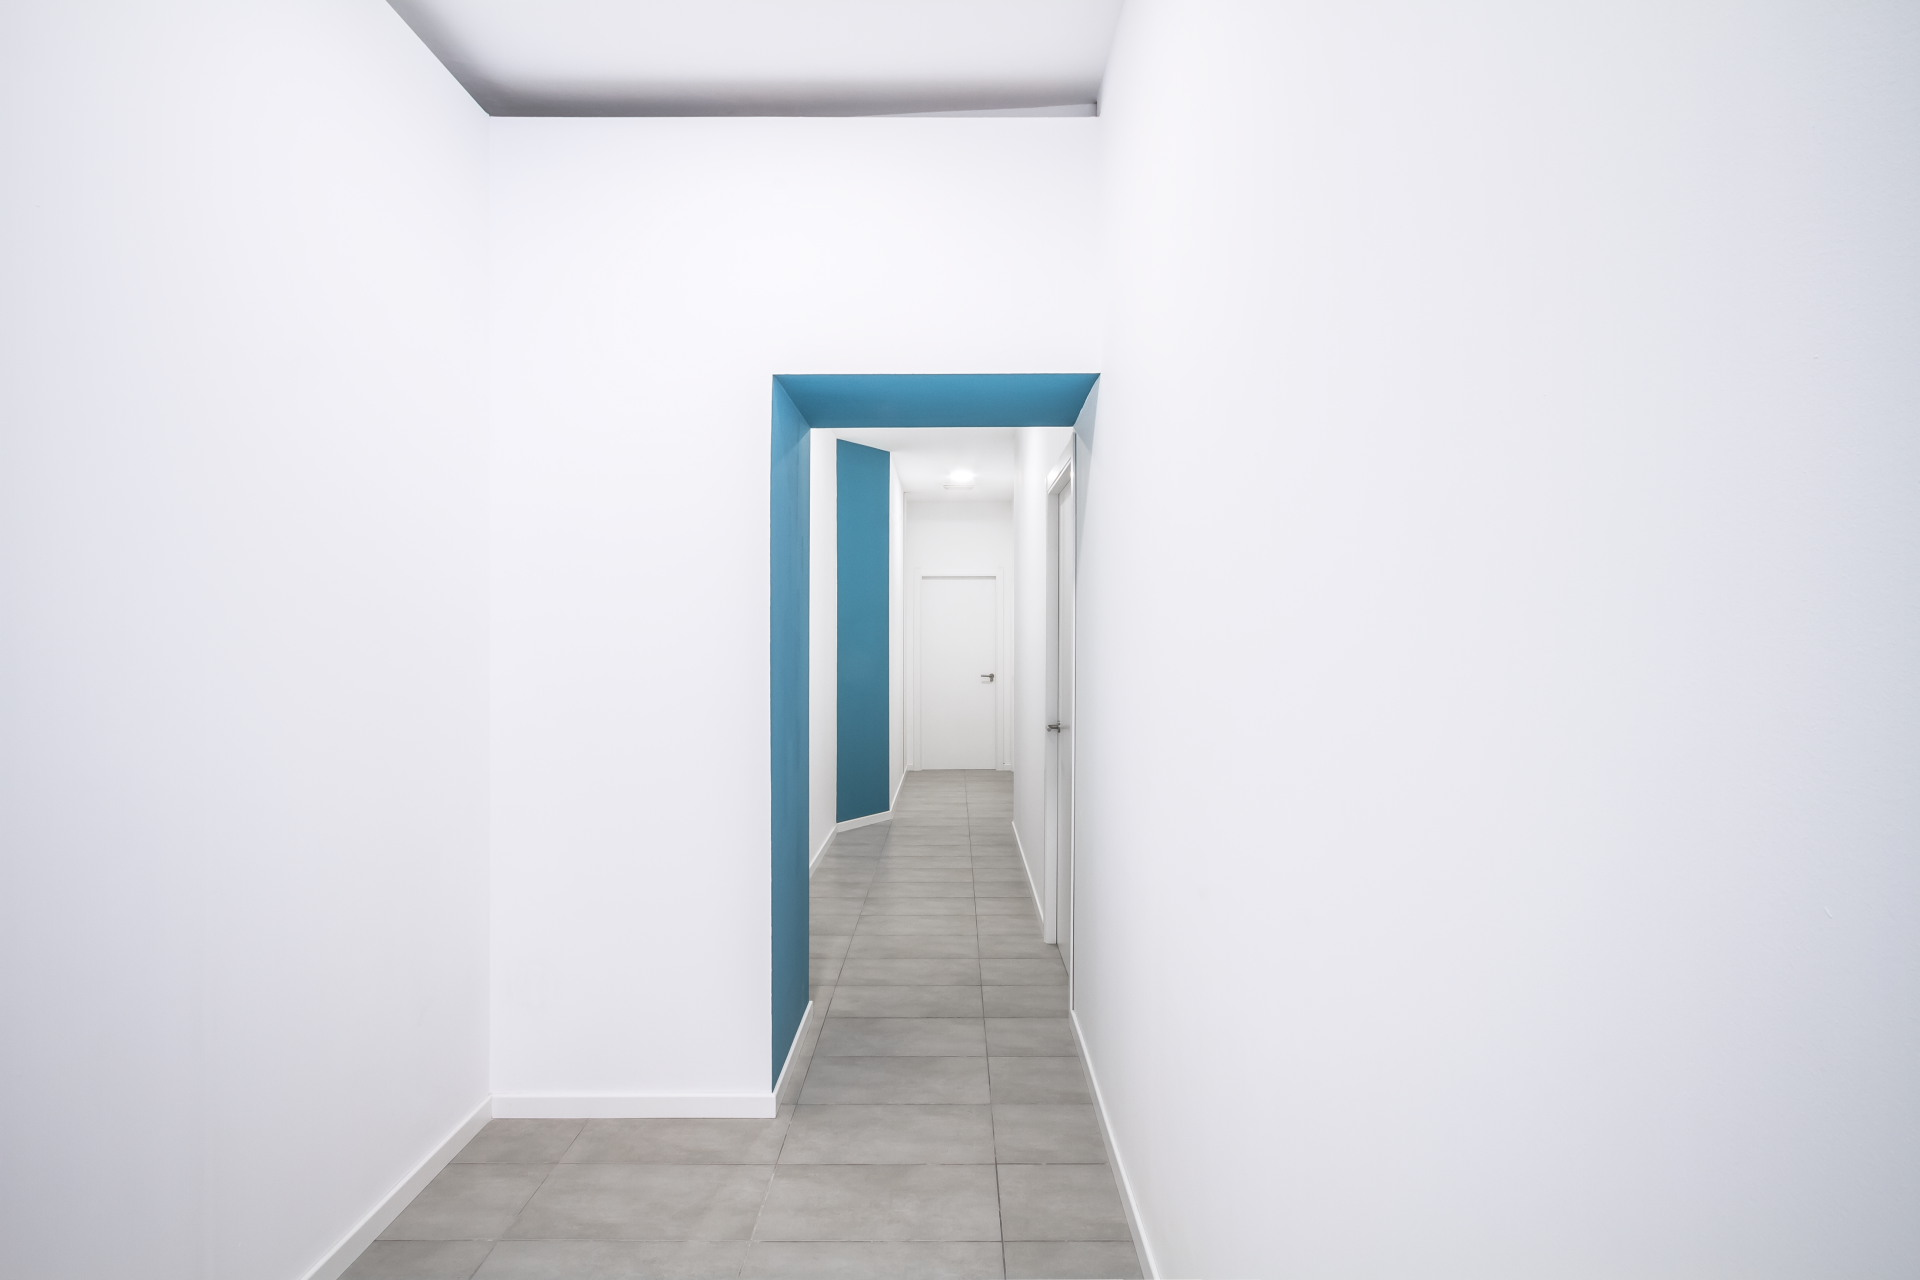 fotografia-arquitectura-valencia-german-cabo-viraje-atelier (6)